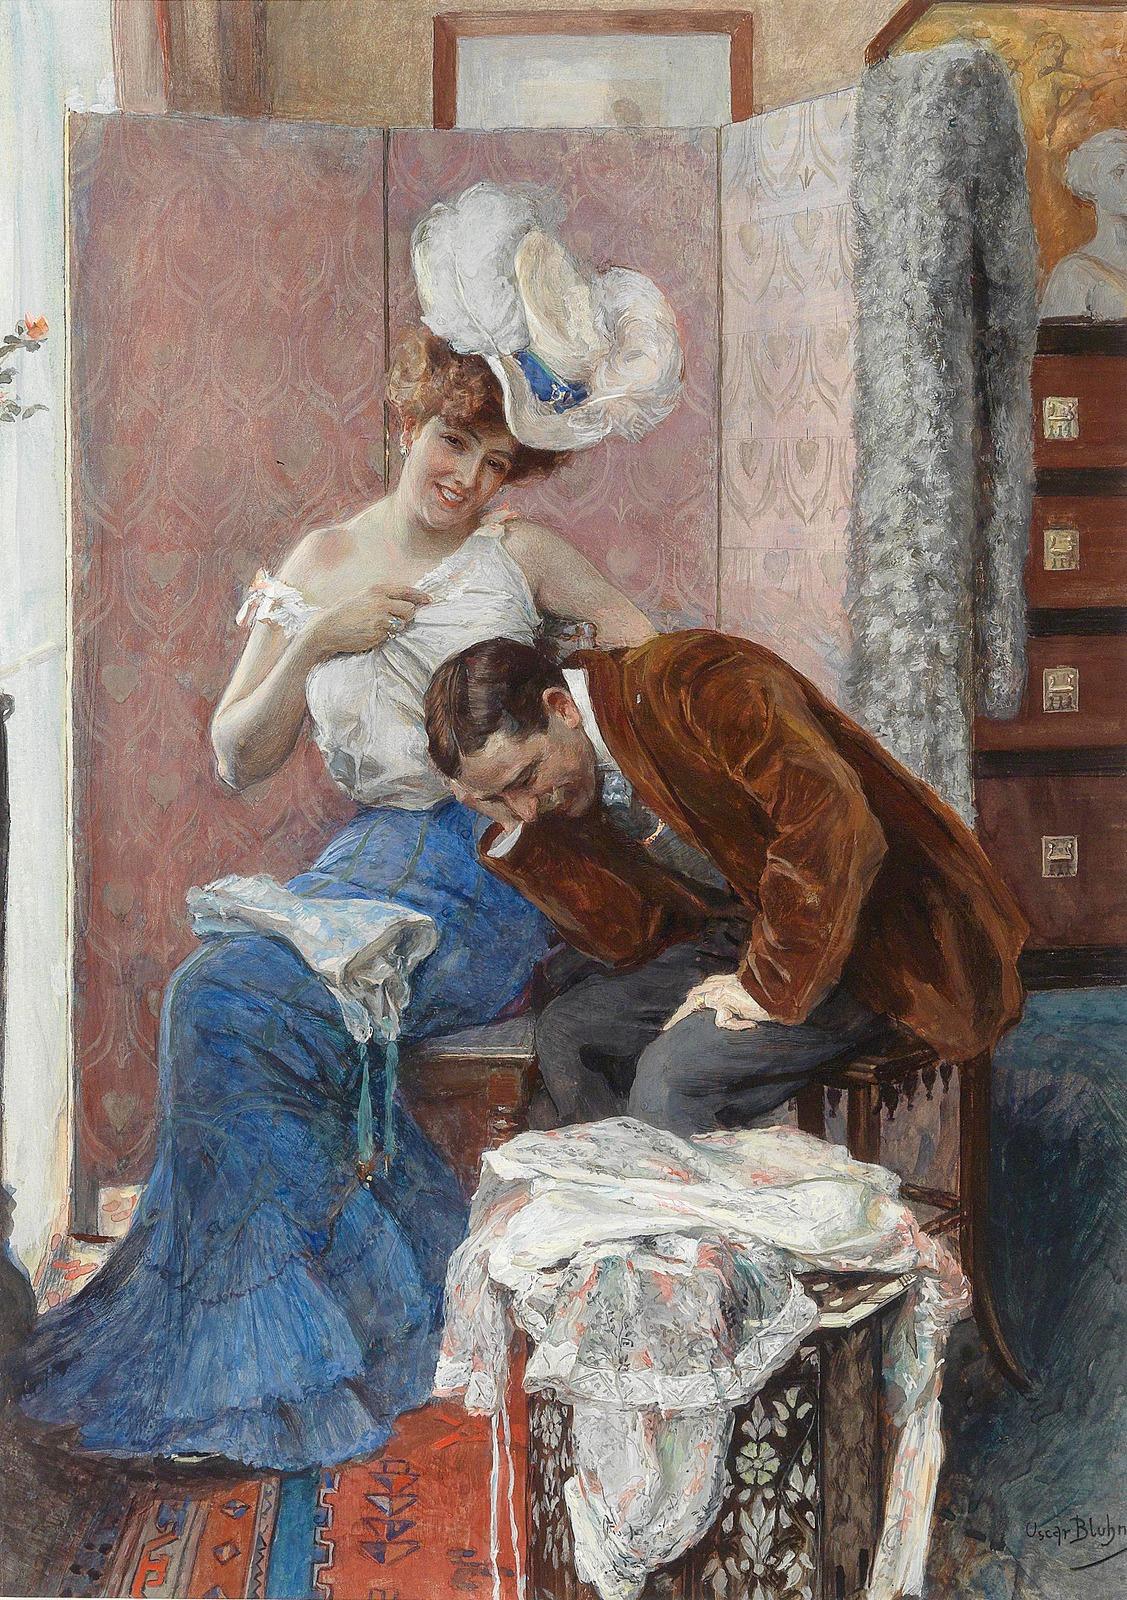 Амурная сцена - врач и пациентка (An amorous scene - the doctor and his patient)_44 х 31_бумага, акварель_Частное слобрание.jpg